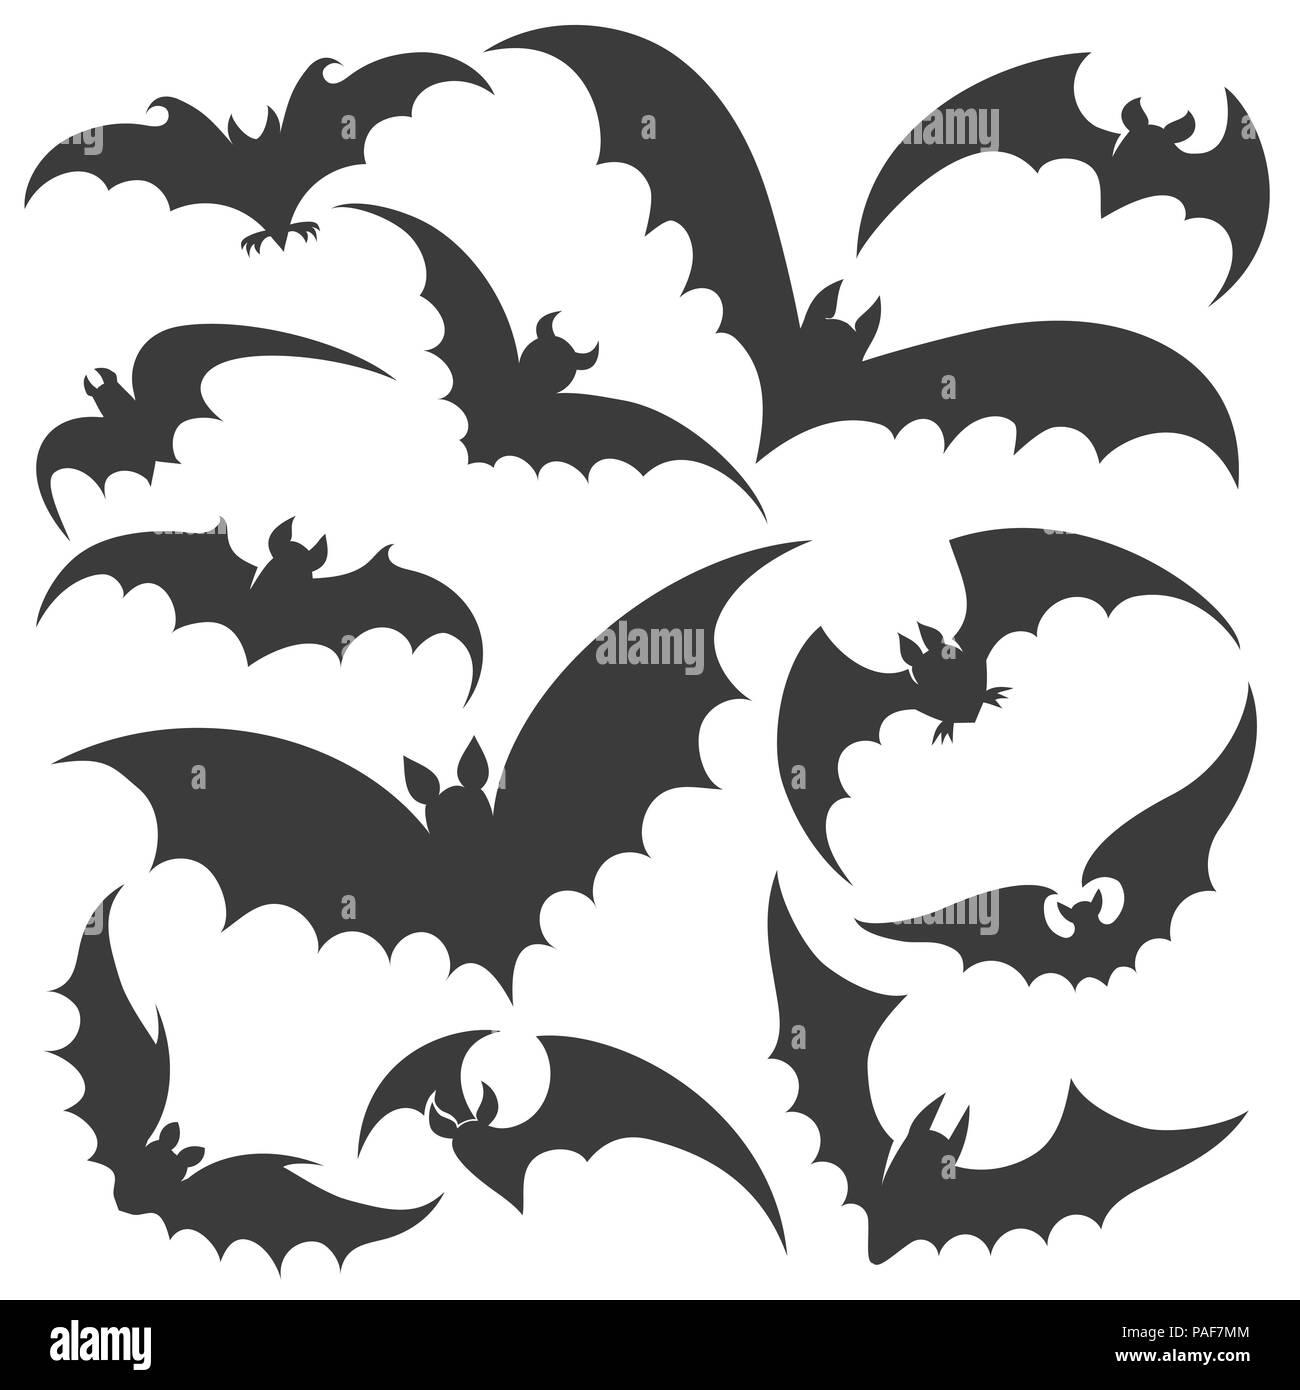 Halloween Vector Black And White.Bat Silhouettes Vector Bats Silhouette Set Halloween Scary Night